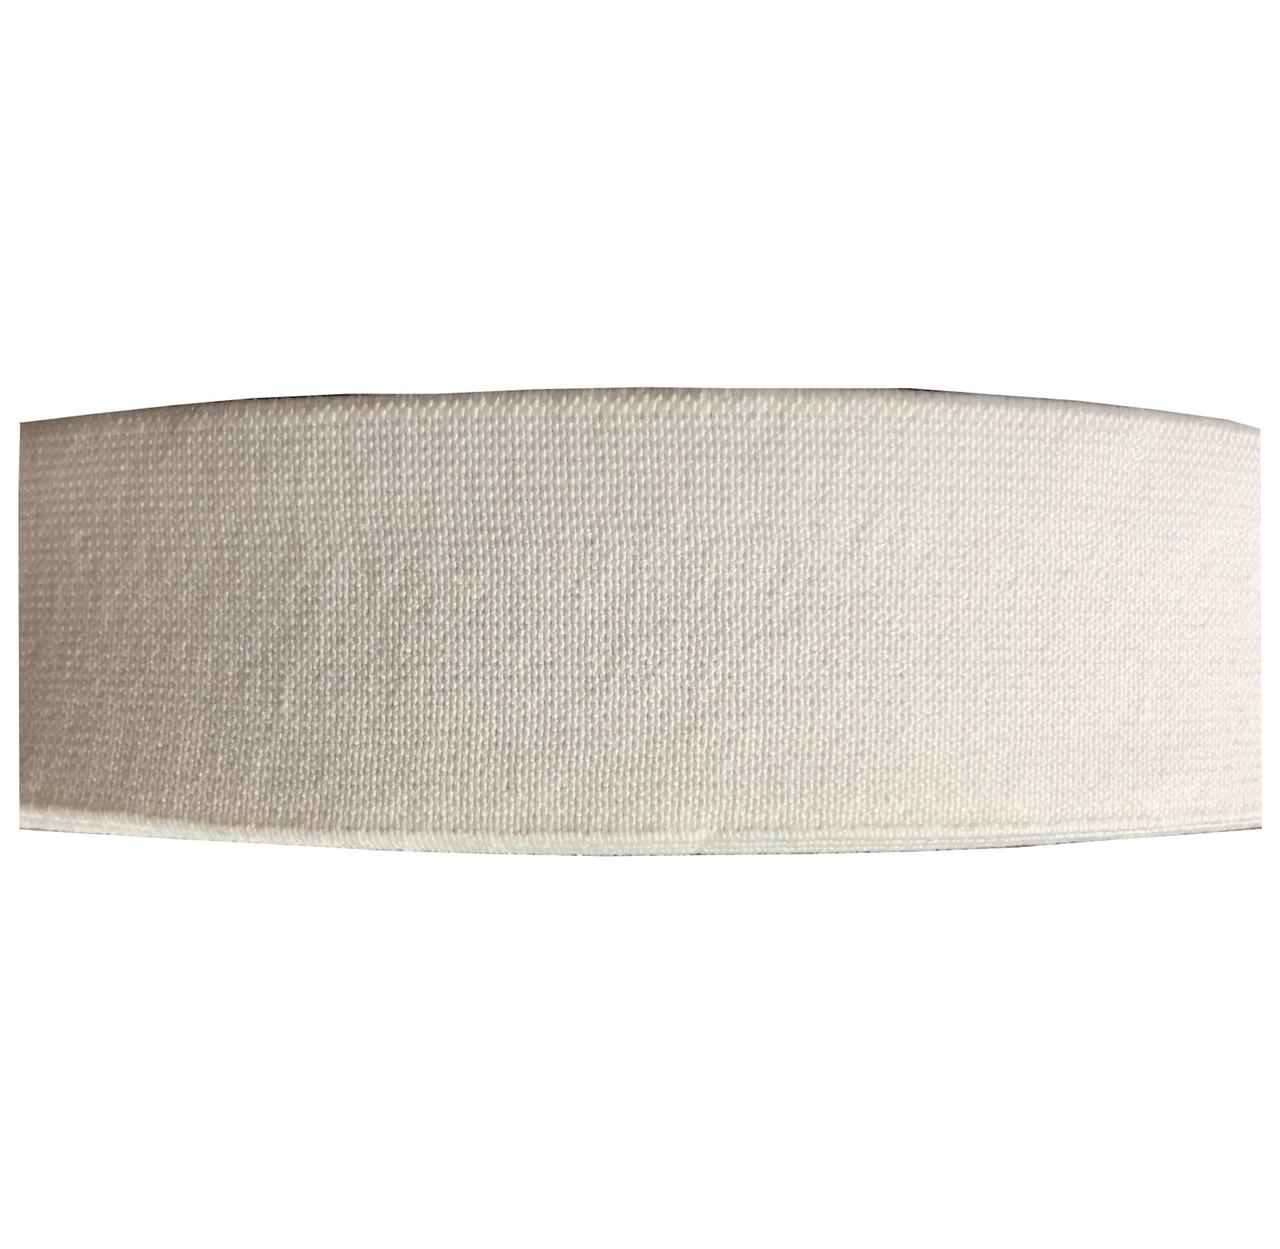 Резинка тканая 035мм цв белый (уп 25м) 3072 Укр-з